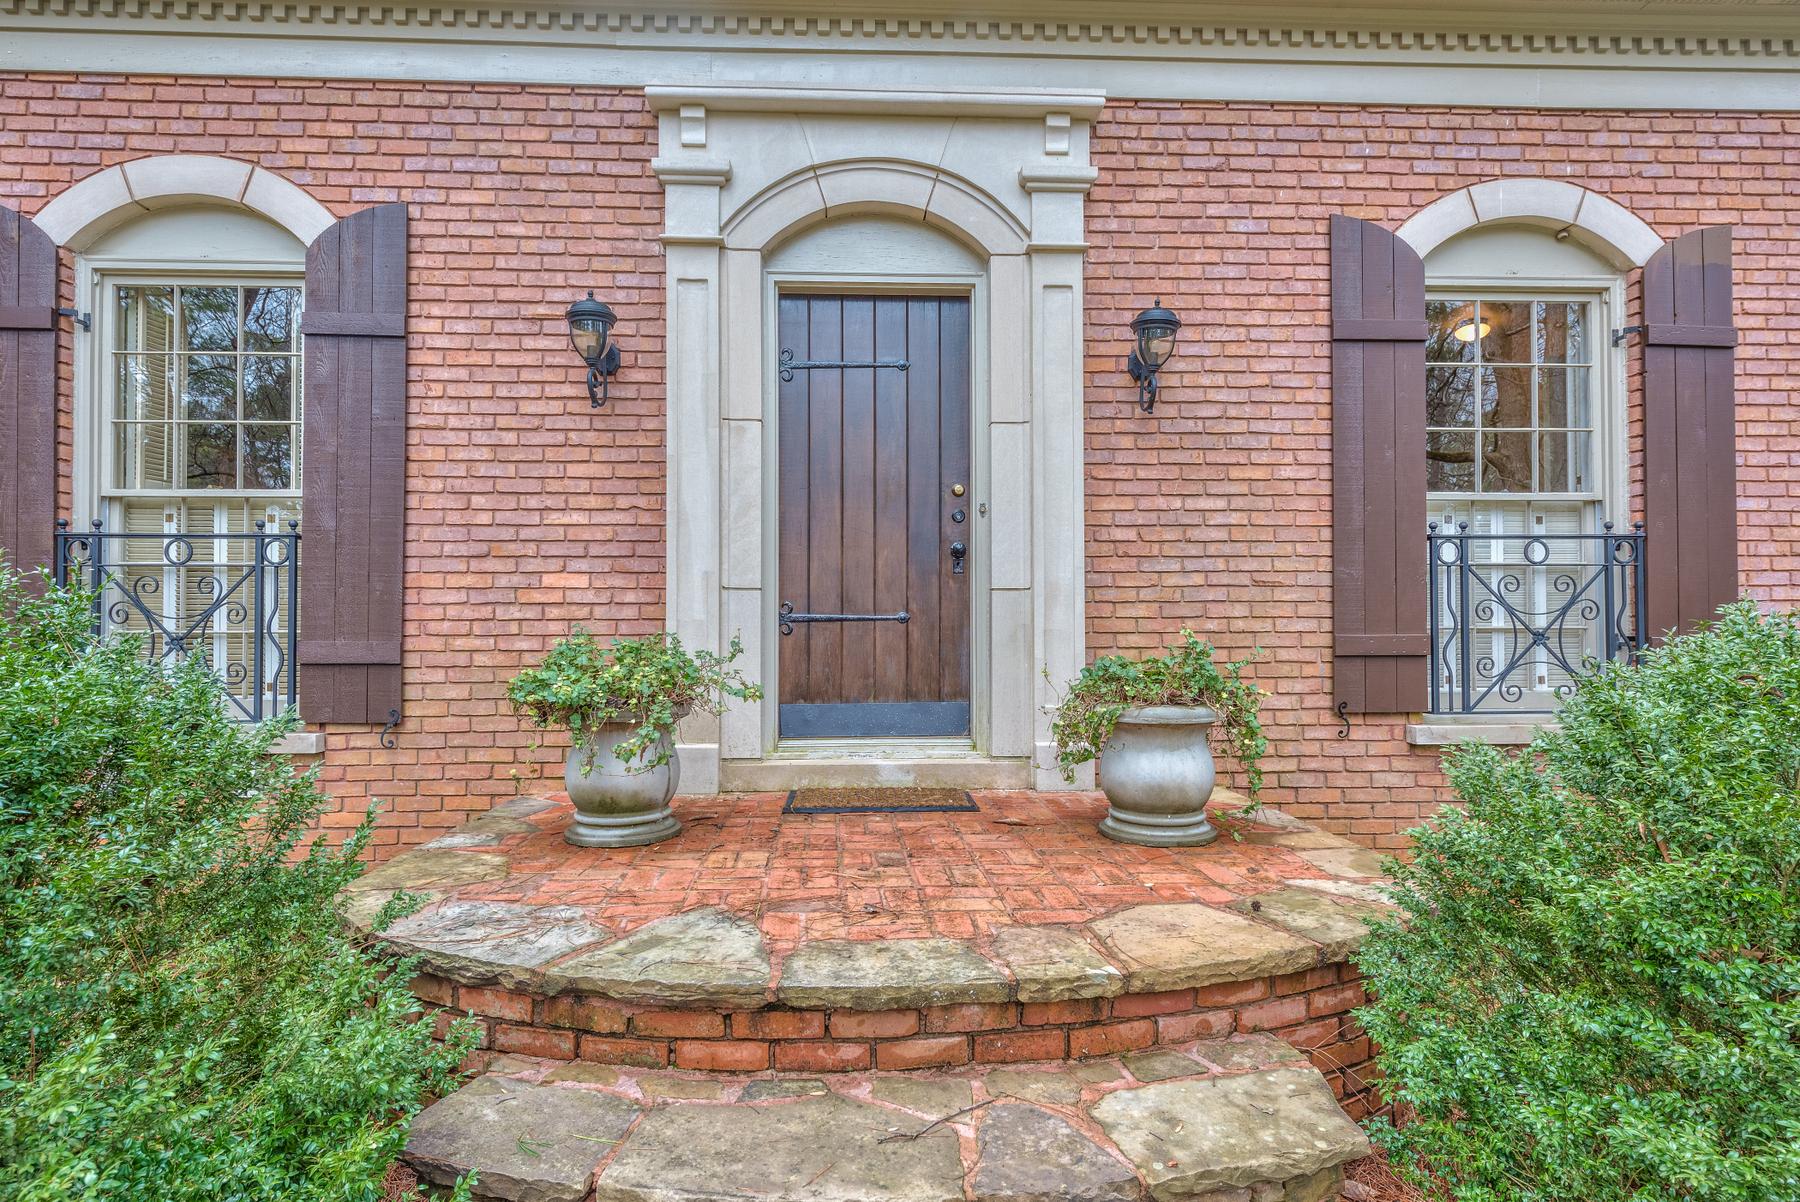 Vivienda unifamiliar por un Venta en Classic Brick and Stone Beauty Nestled on a Private Acre+ 1120 Huntcliff Sandy Springs, Georgia, 30350 Estados Unidos